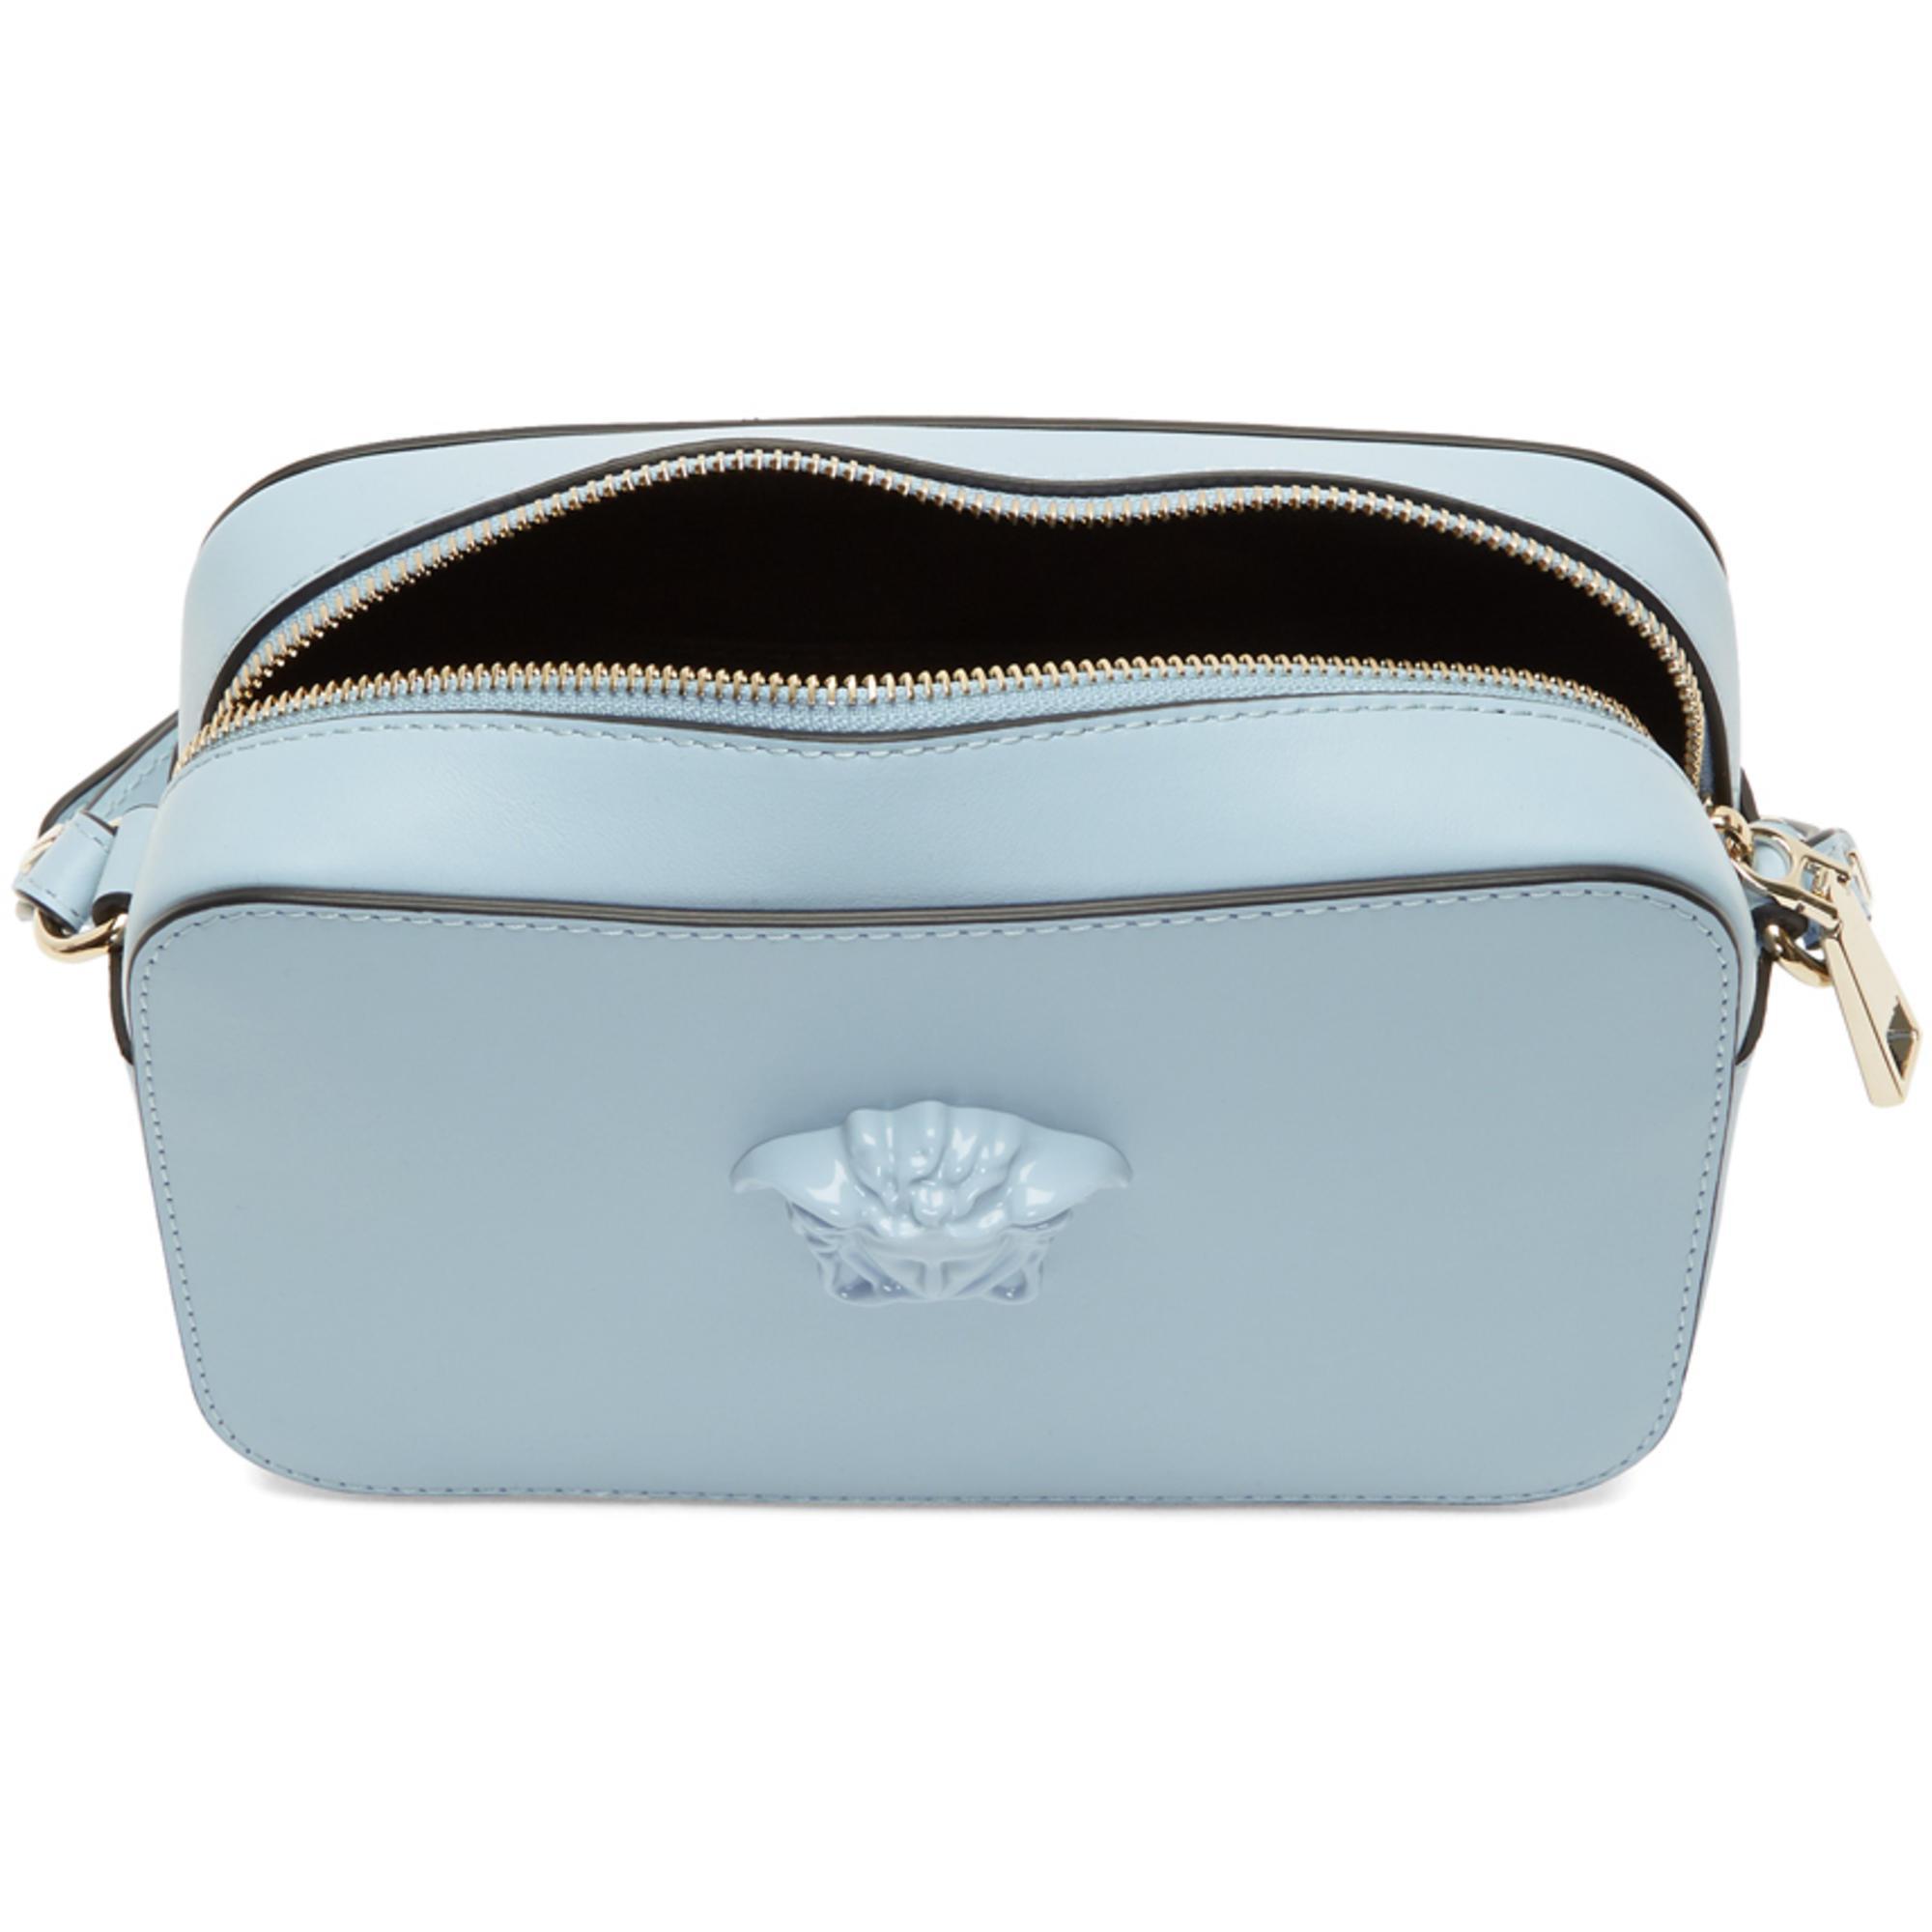 e7b80e15d13 ... Versace Blue Medusa Camera Bag in Blue - Lyst save off e0815 e5bc5  Buy  Versace Palazzo Medusa Camera Bag Leather Small White 3492201 – Rebag ...